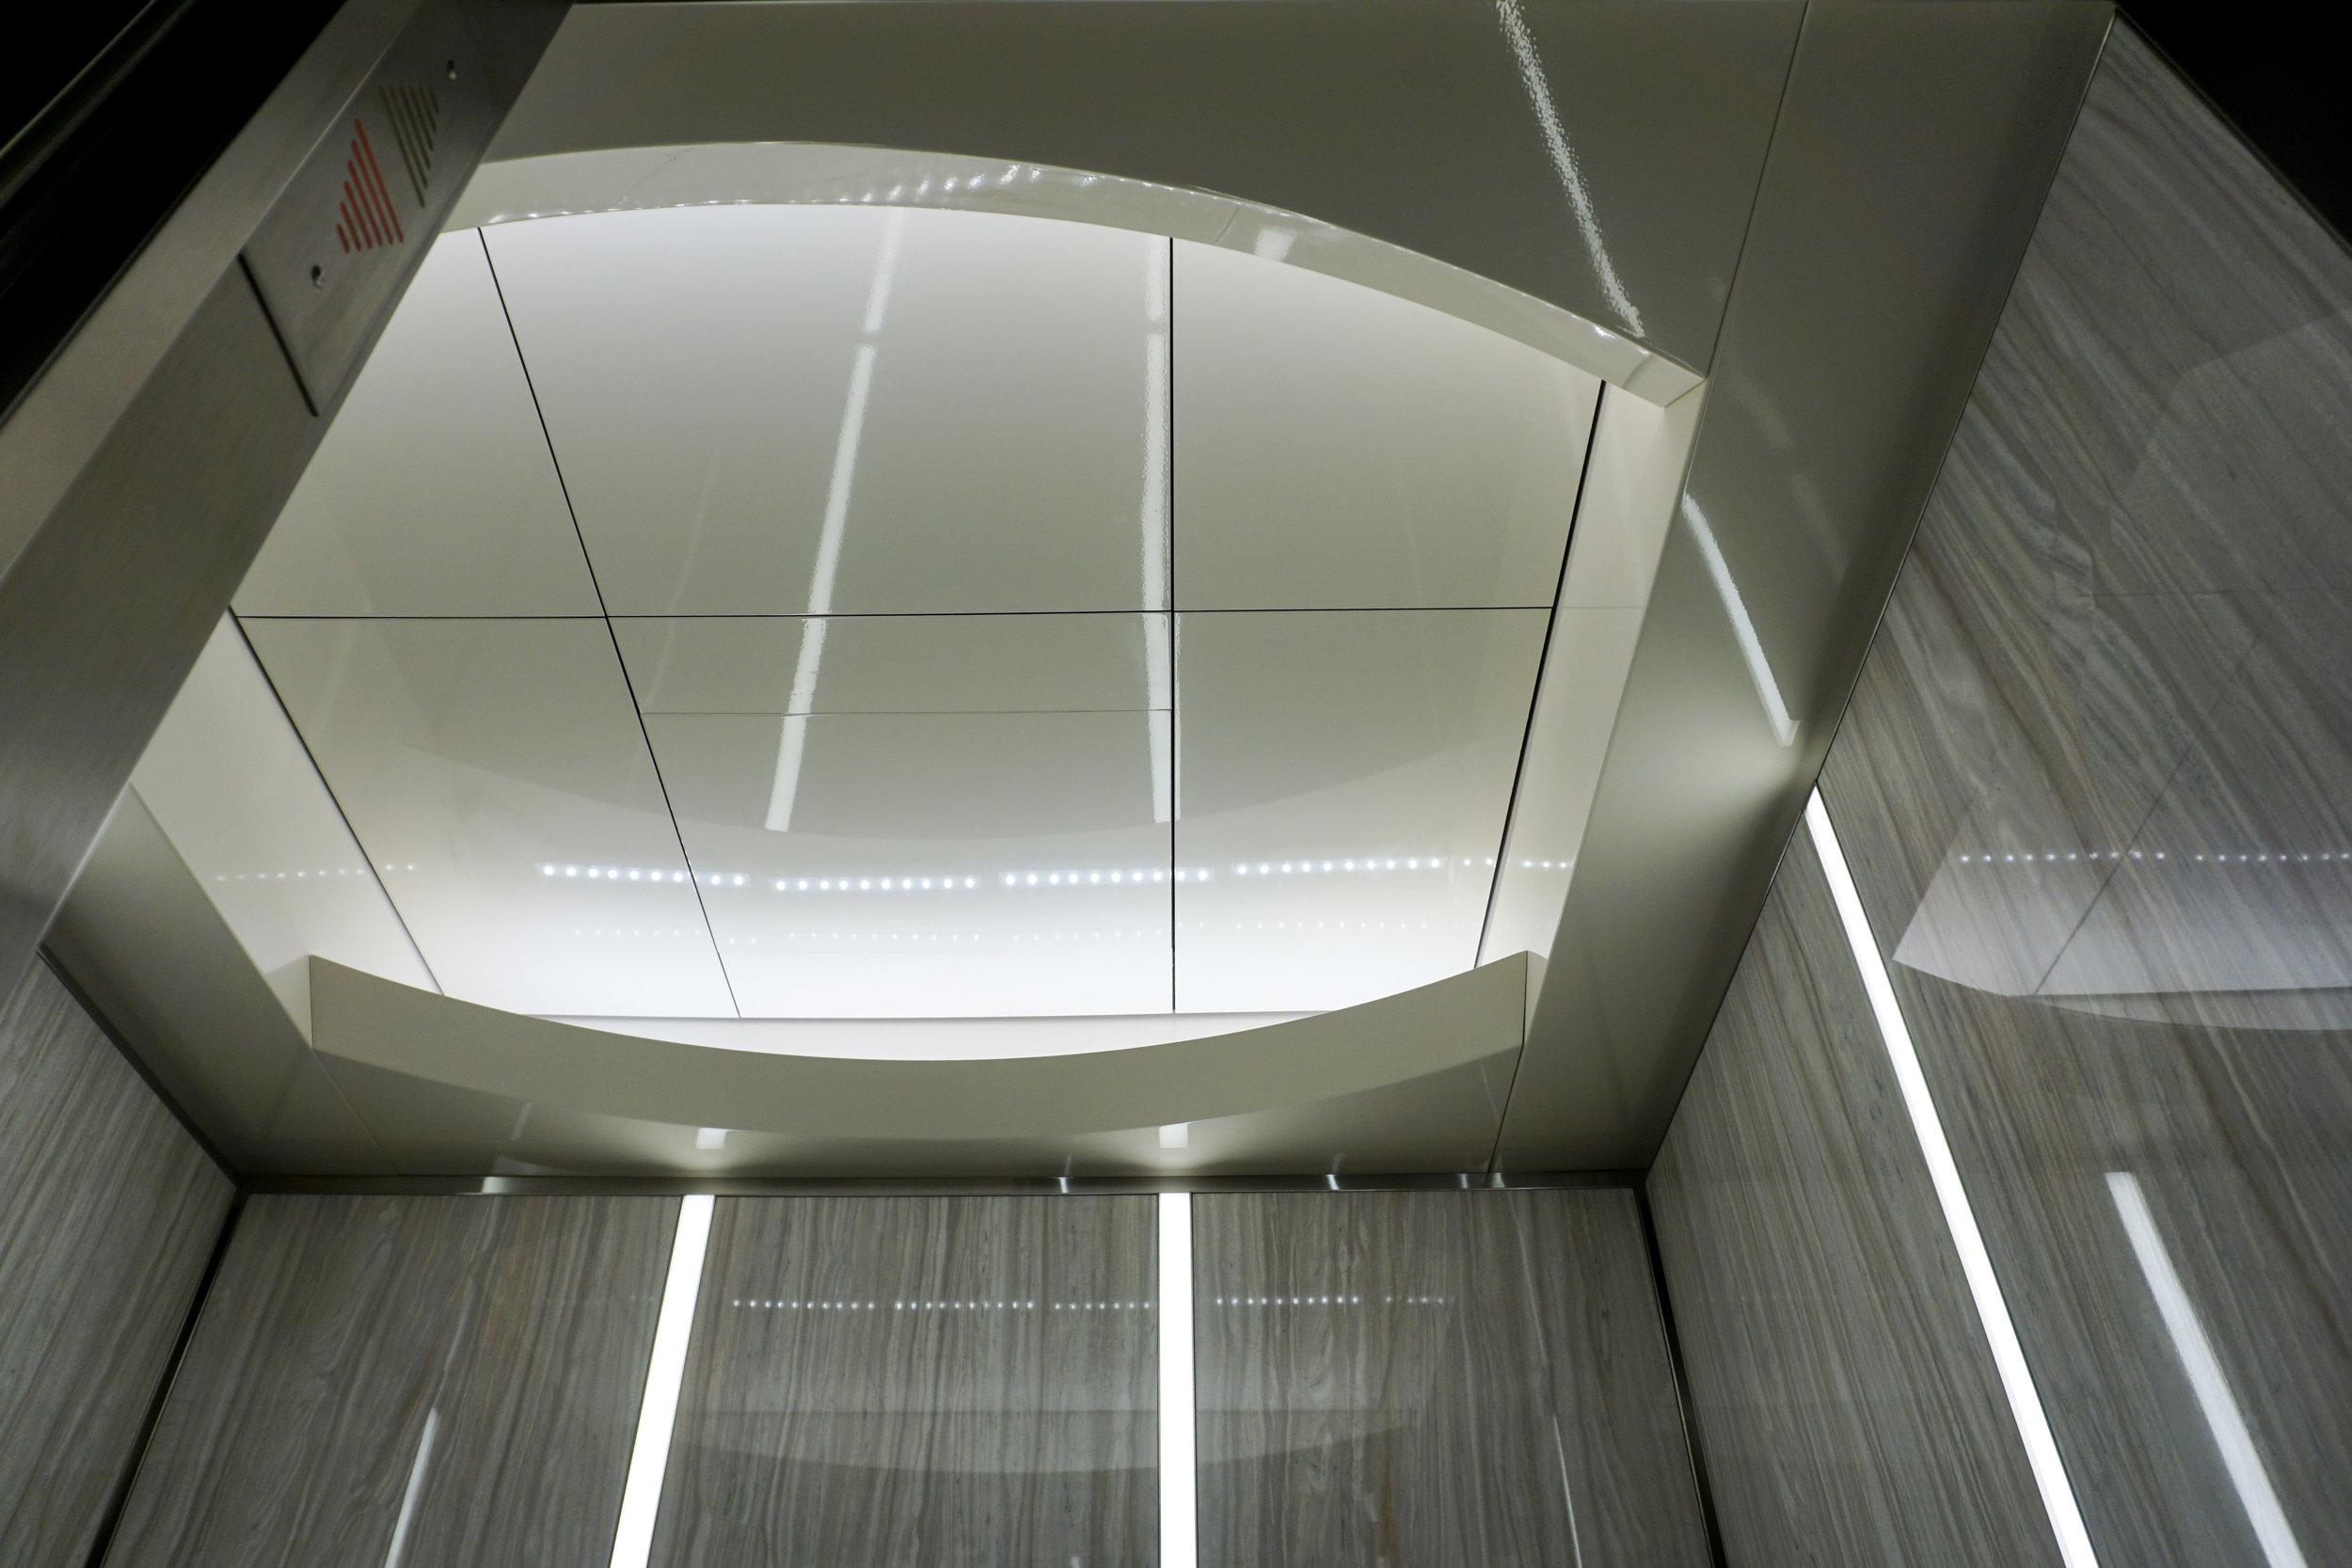 Ceiling: Existing ceiling painted in Benjamin Moore Semi Gloss Paint